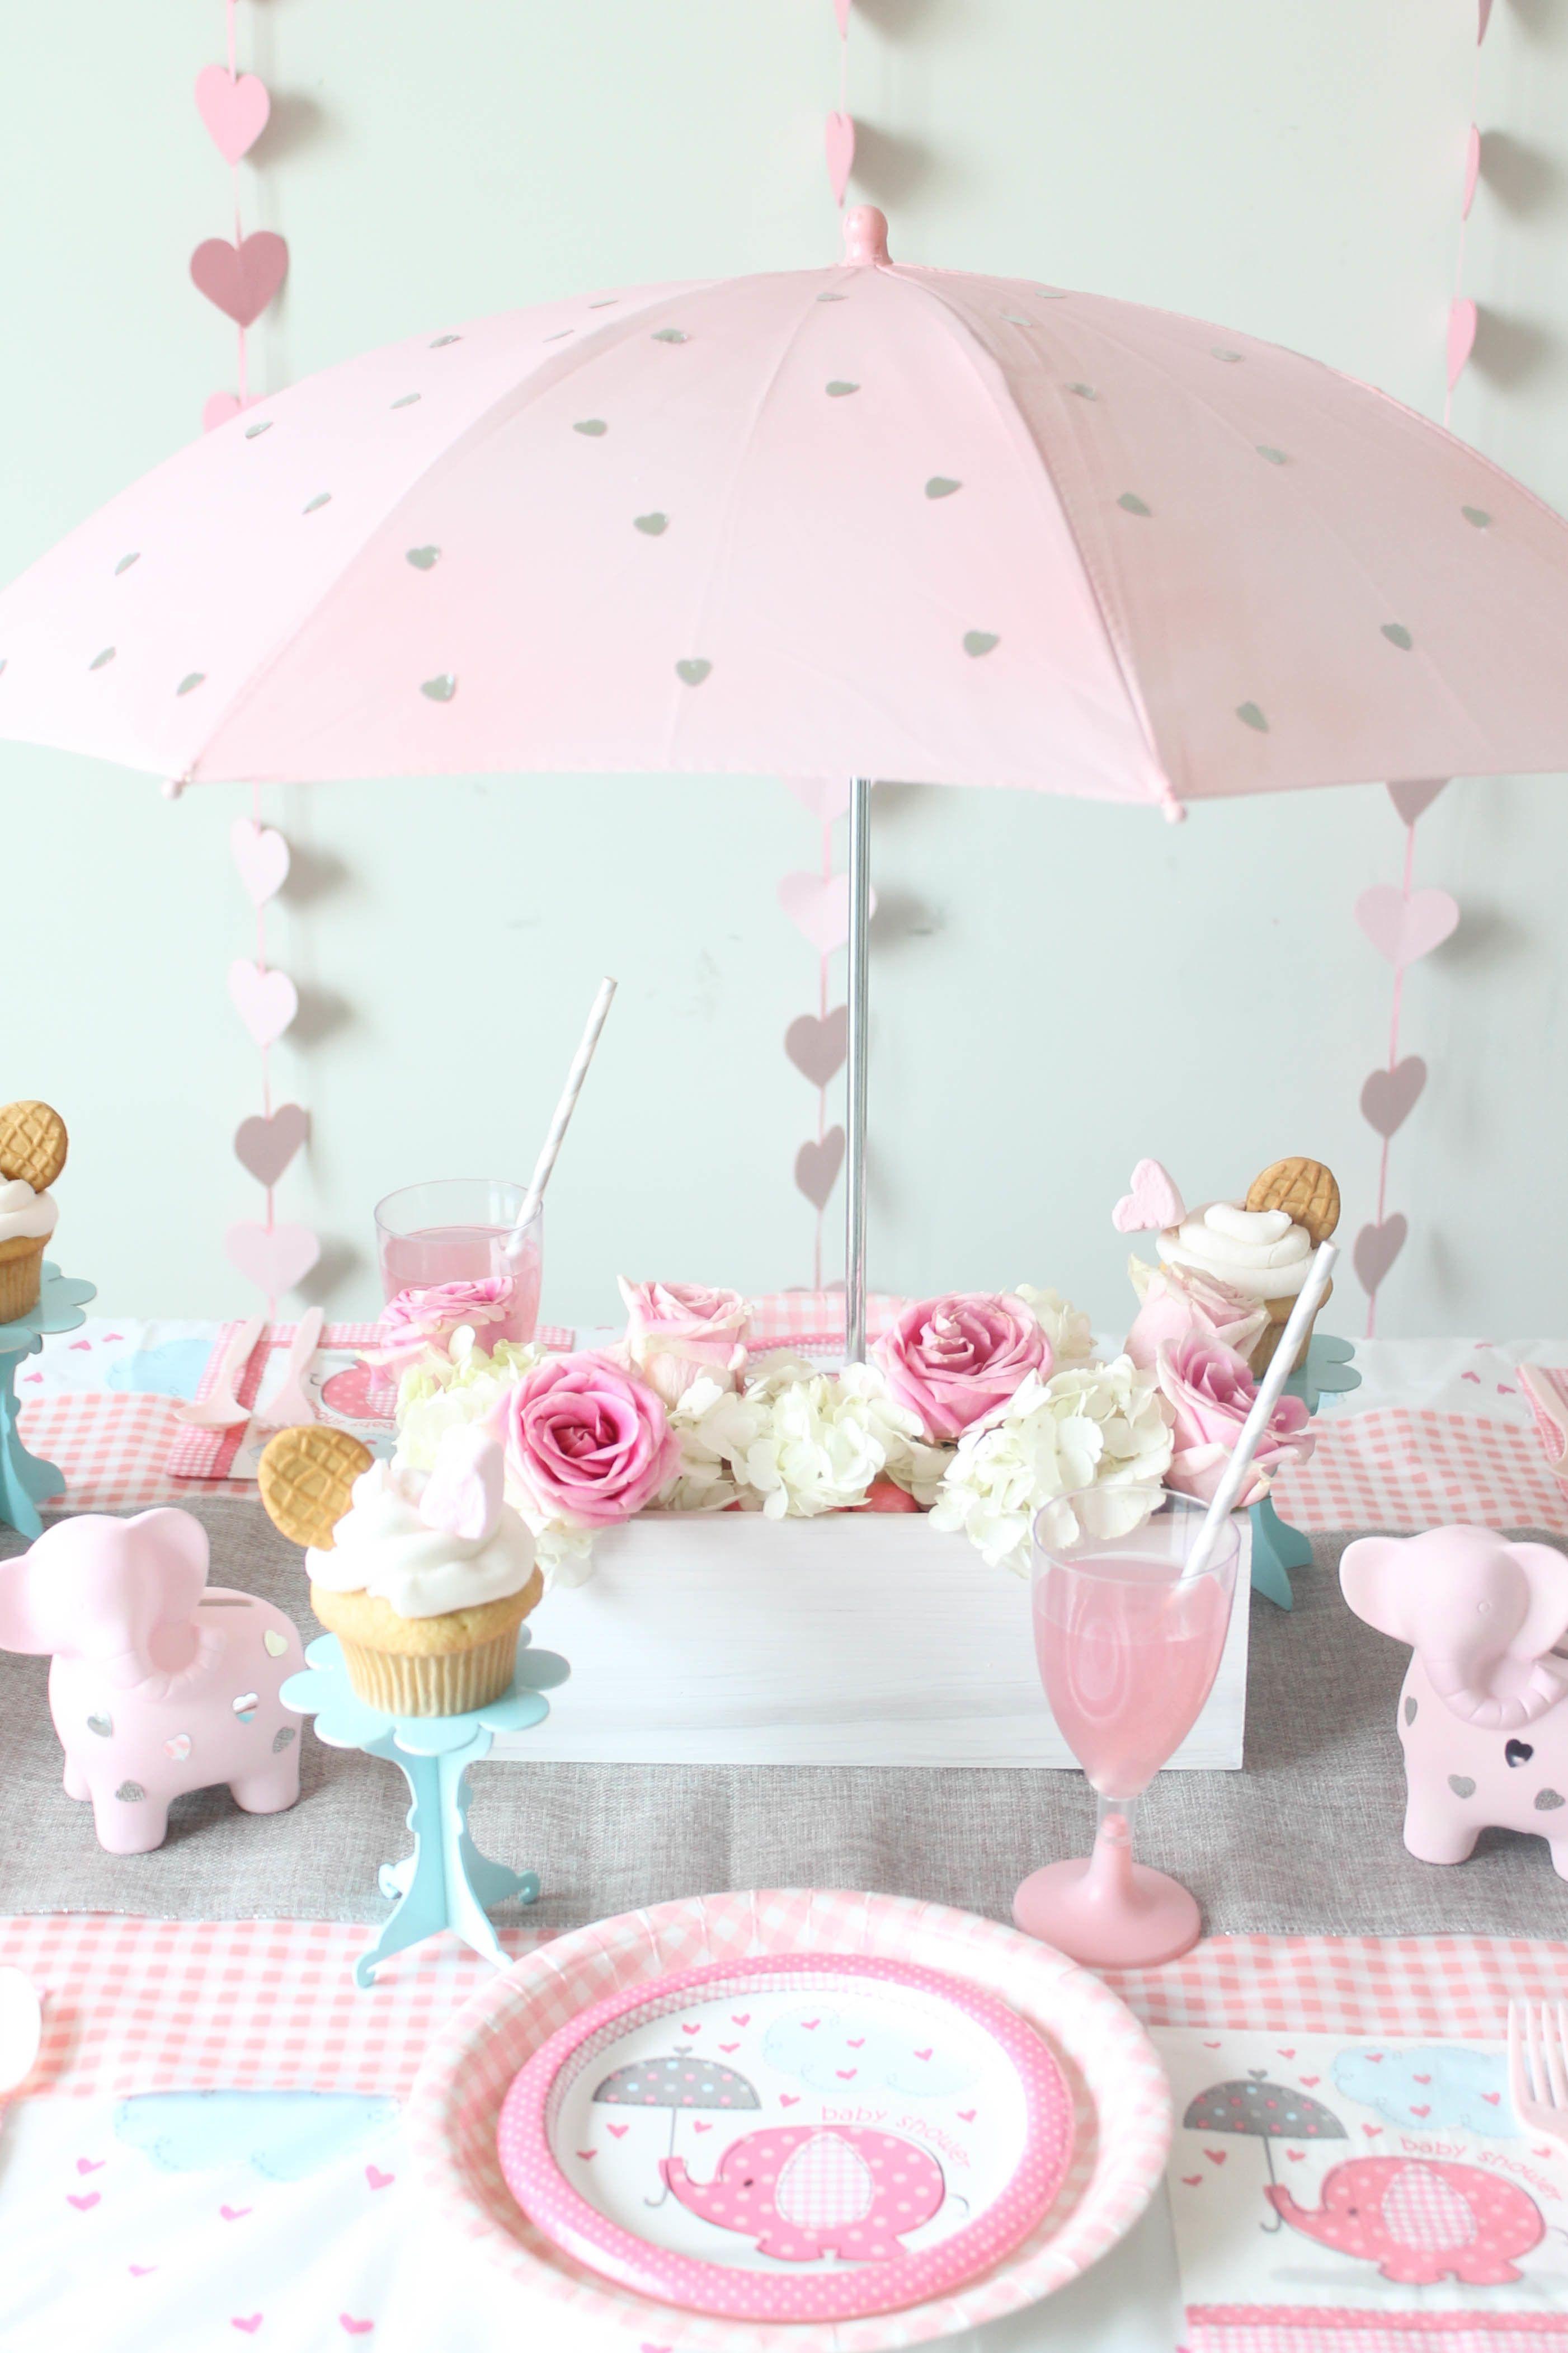 Diy Umbrella Centerpiece Mary Willis Baby Shower Decorations